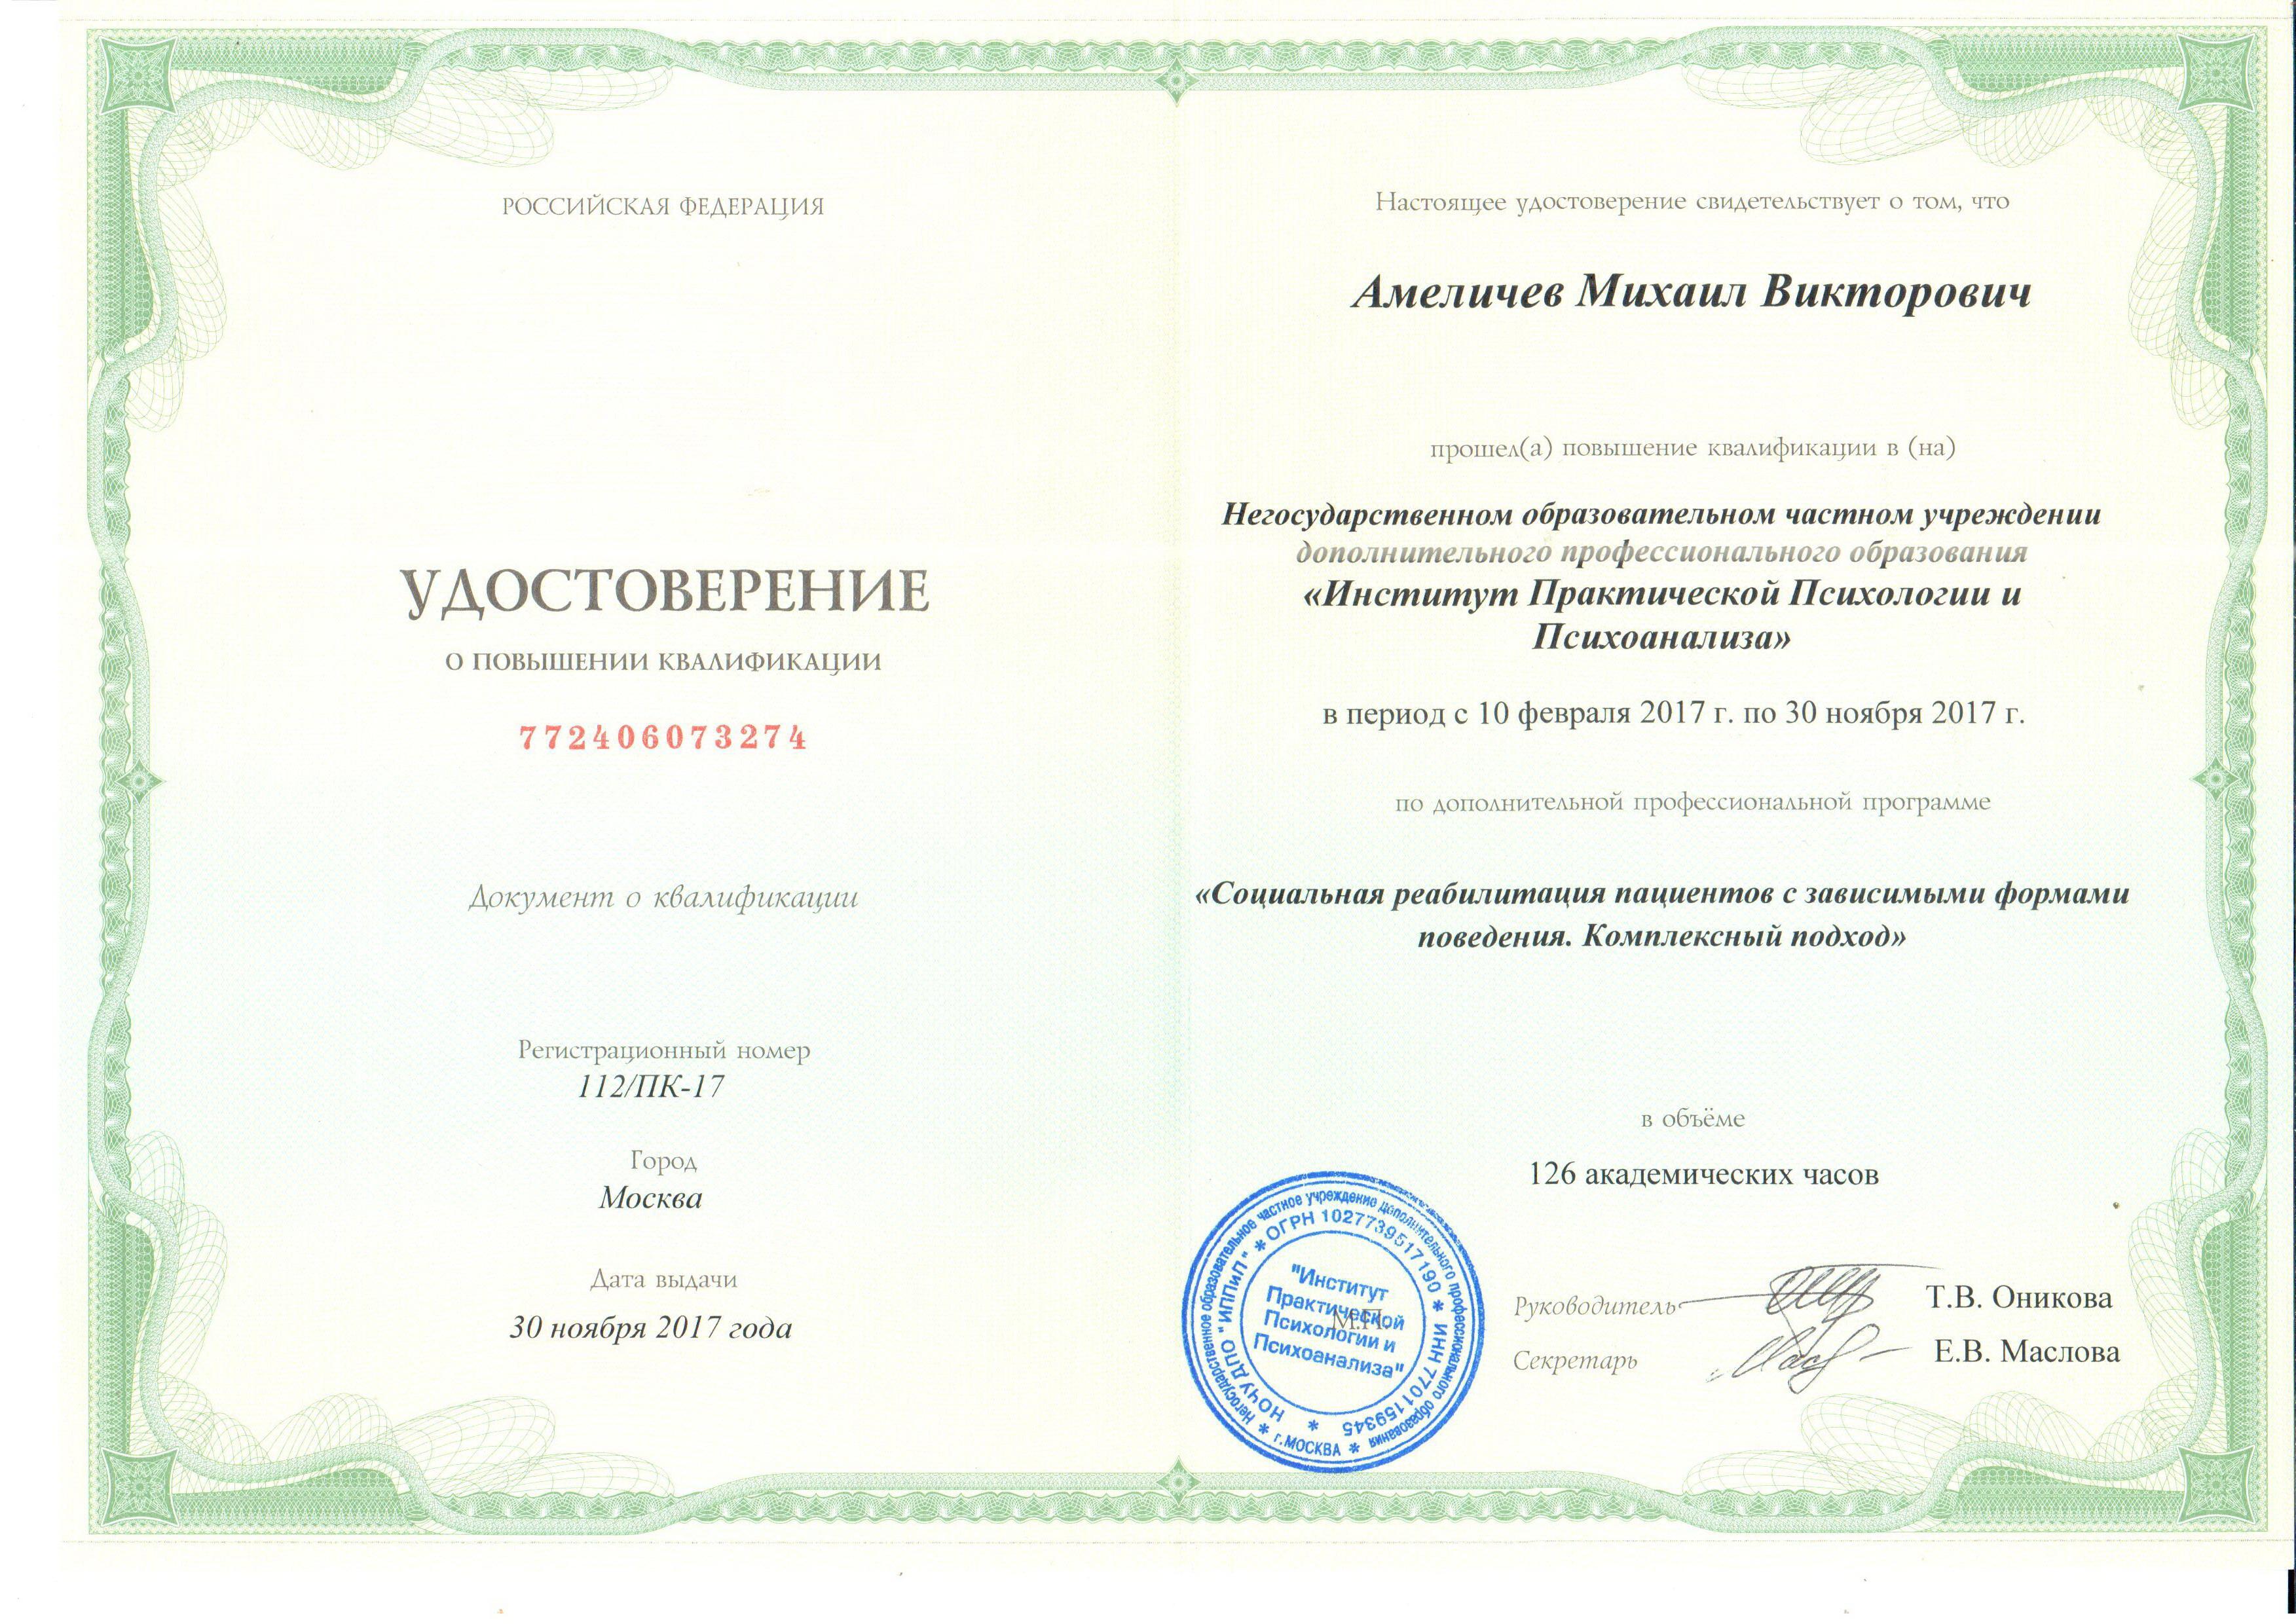 Амеличев Михаил Викторович 2